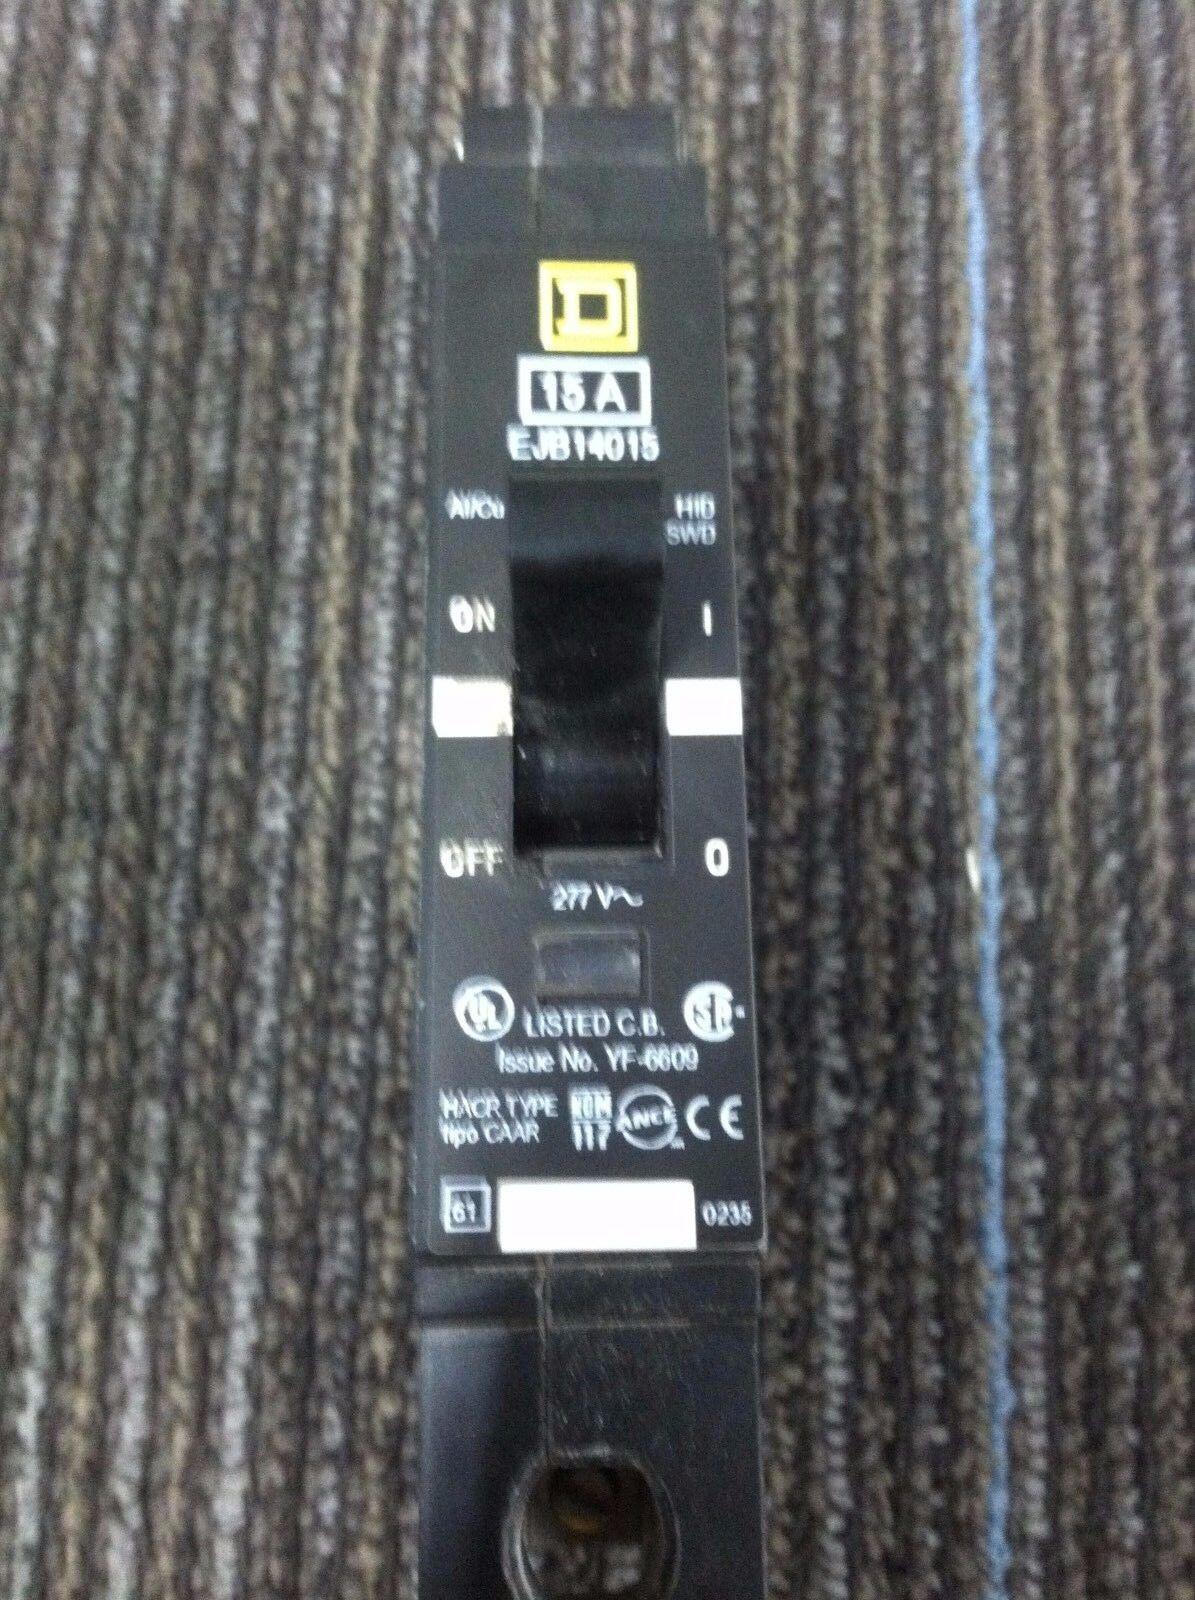 EJB14015 Lighting Circuit Breaker 65k Rated Square D | eBay